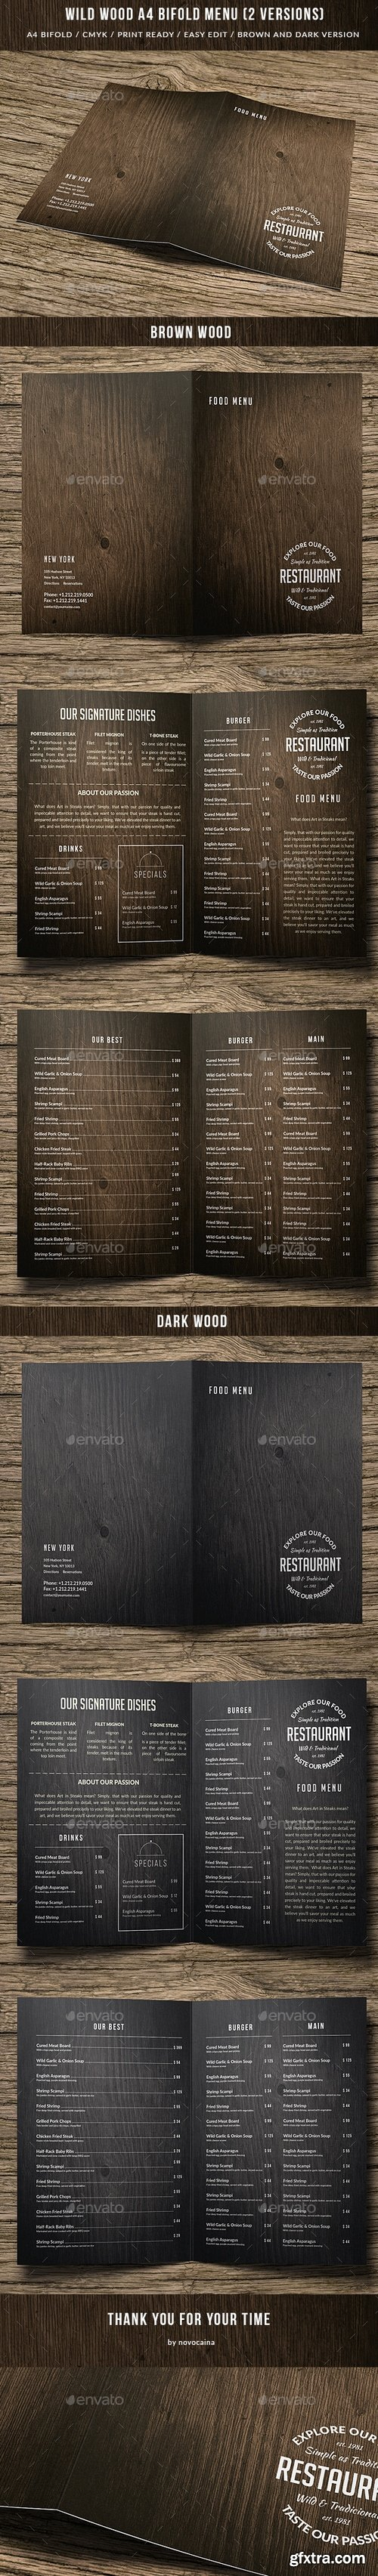 Graphicriver - Wild Wood A4 Bifold Menu - 2 Color Versions 15645295